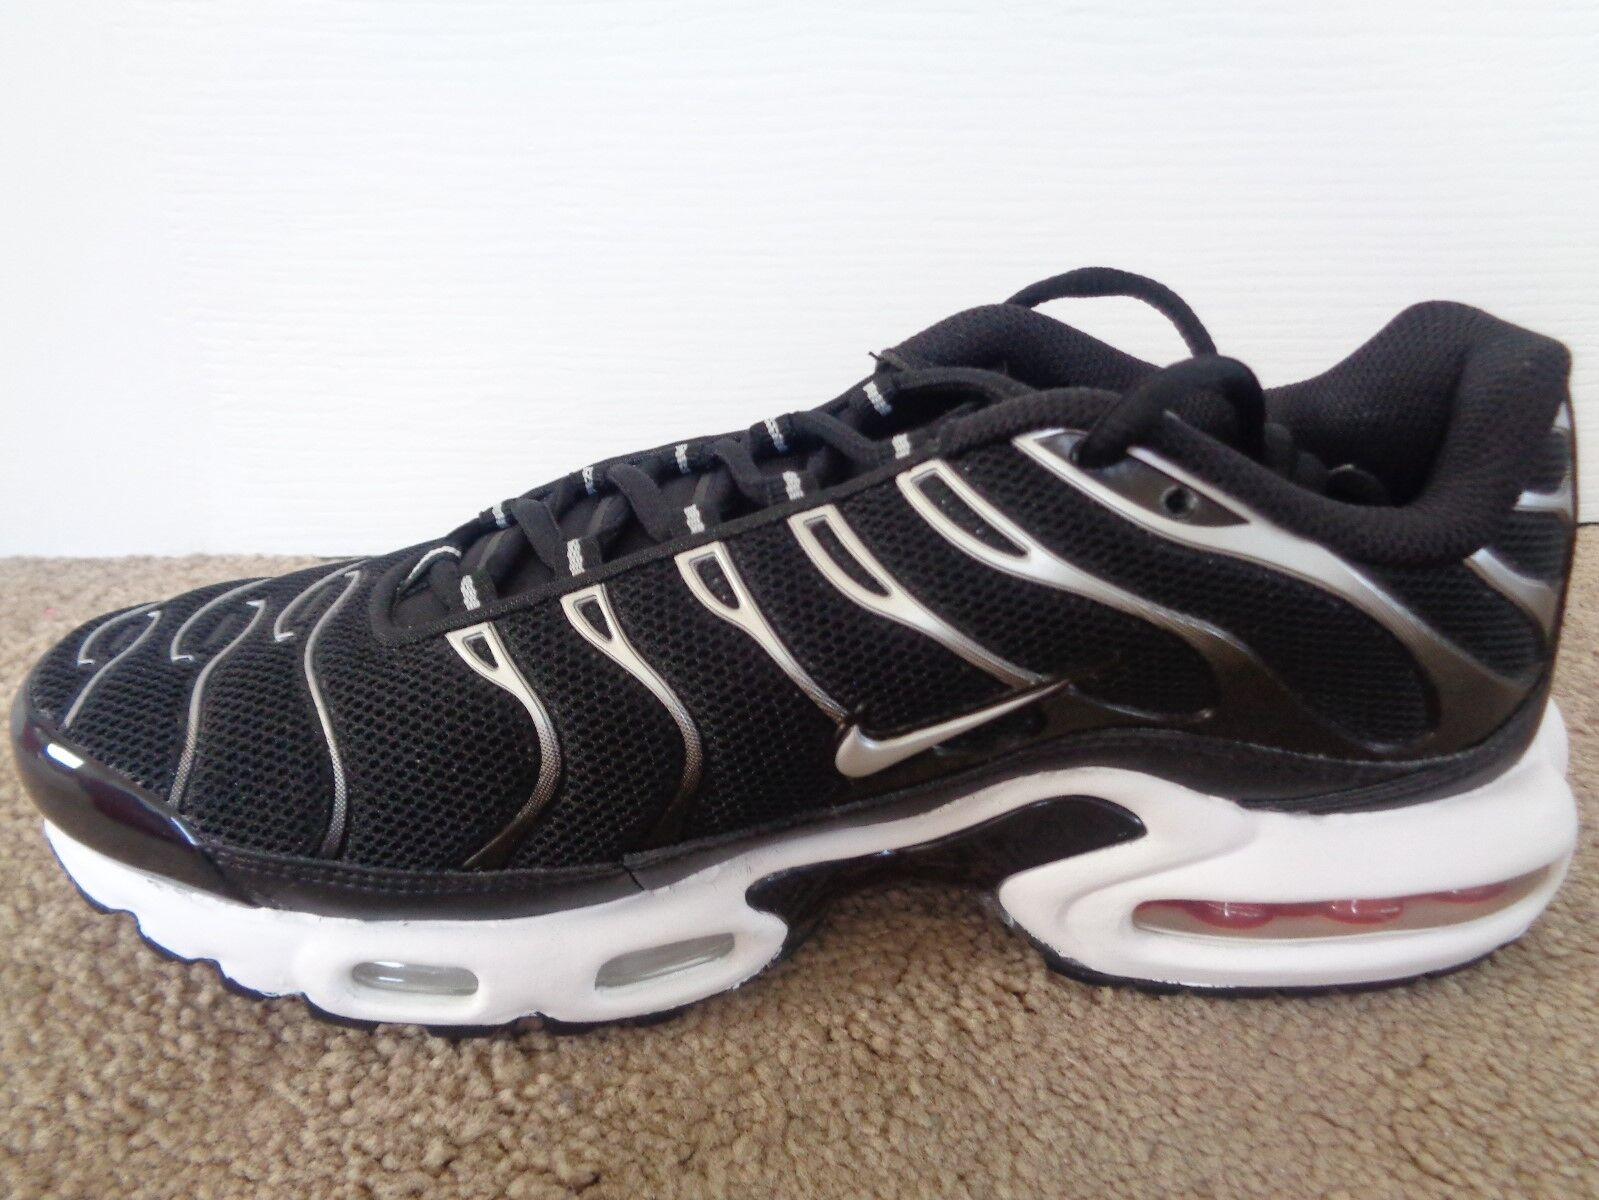 Nike Air max plus PRM trainers Turnschuhe 815994 001 uk 7 6 eu 40 us 7 uk NEW+BOX cd2d45